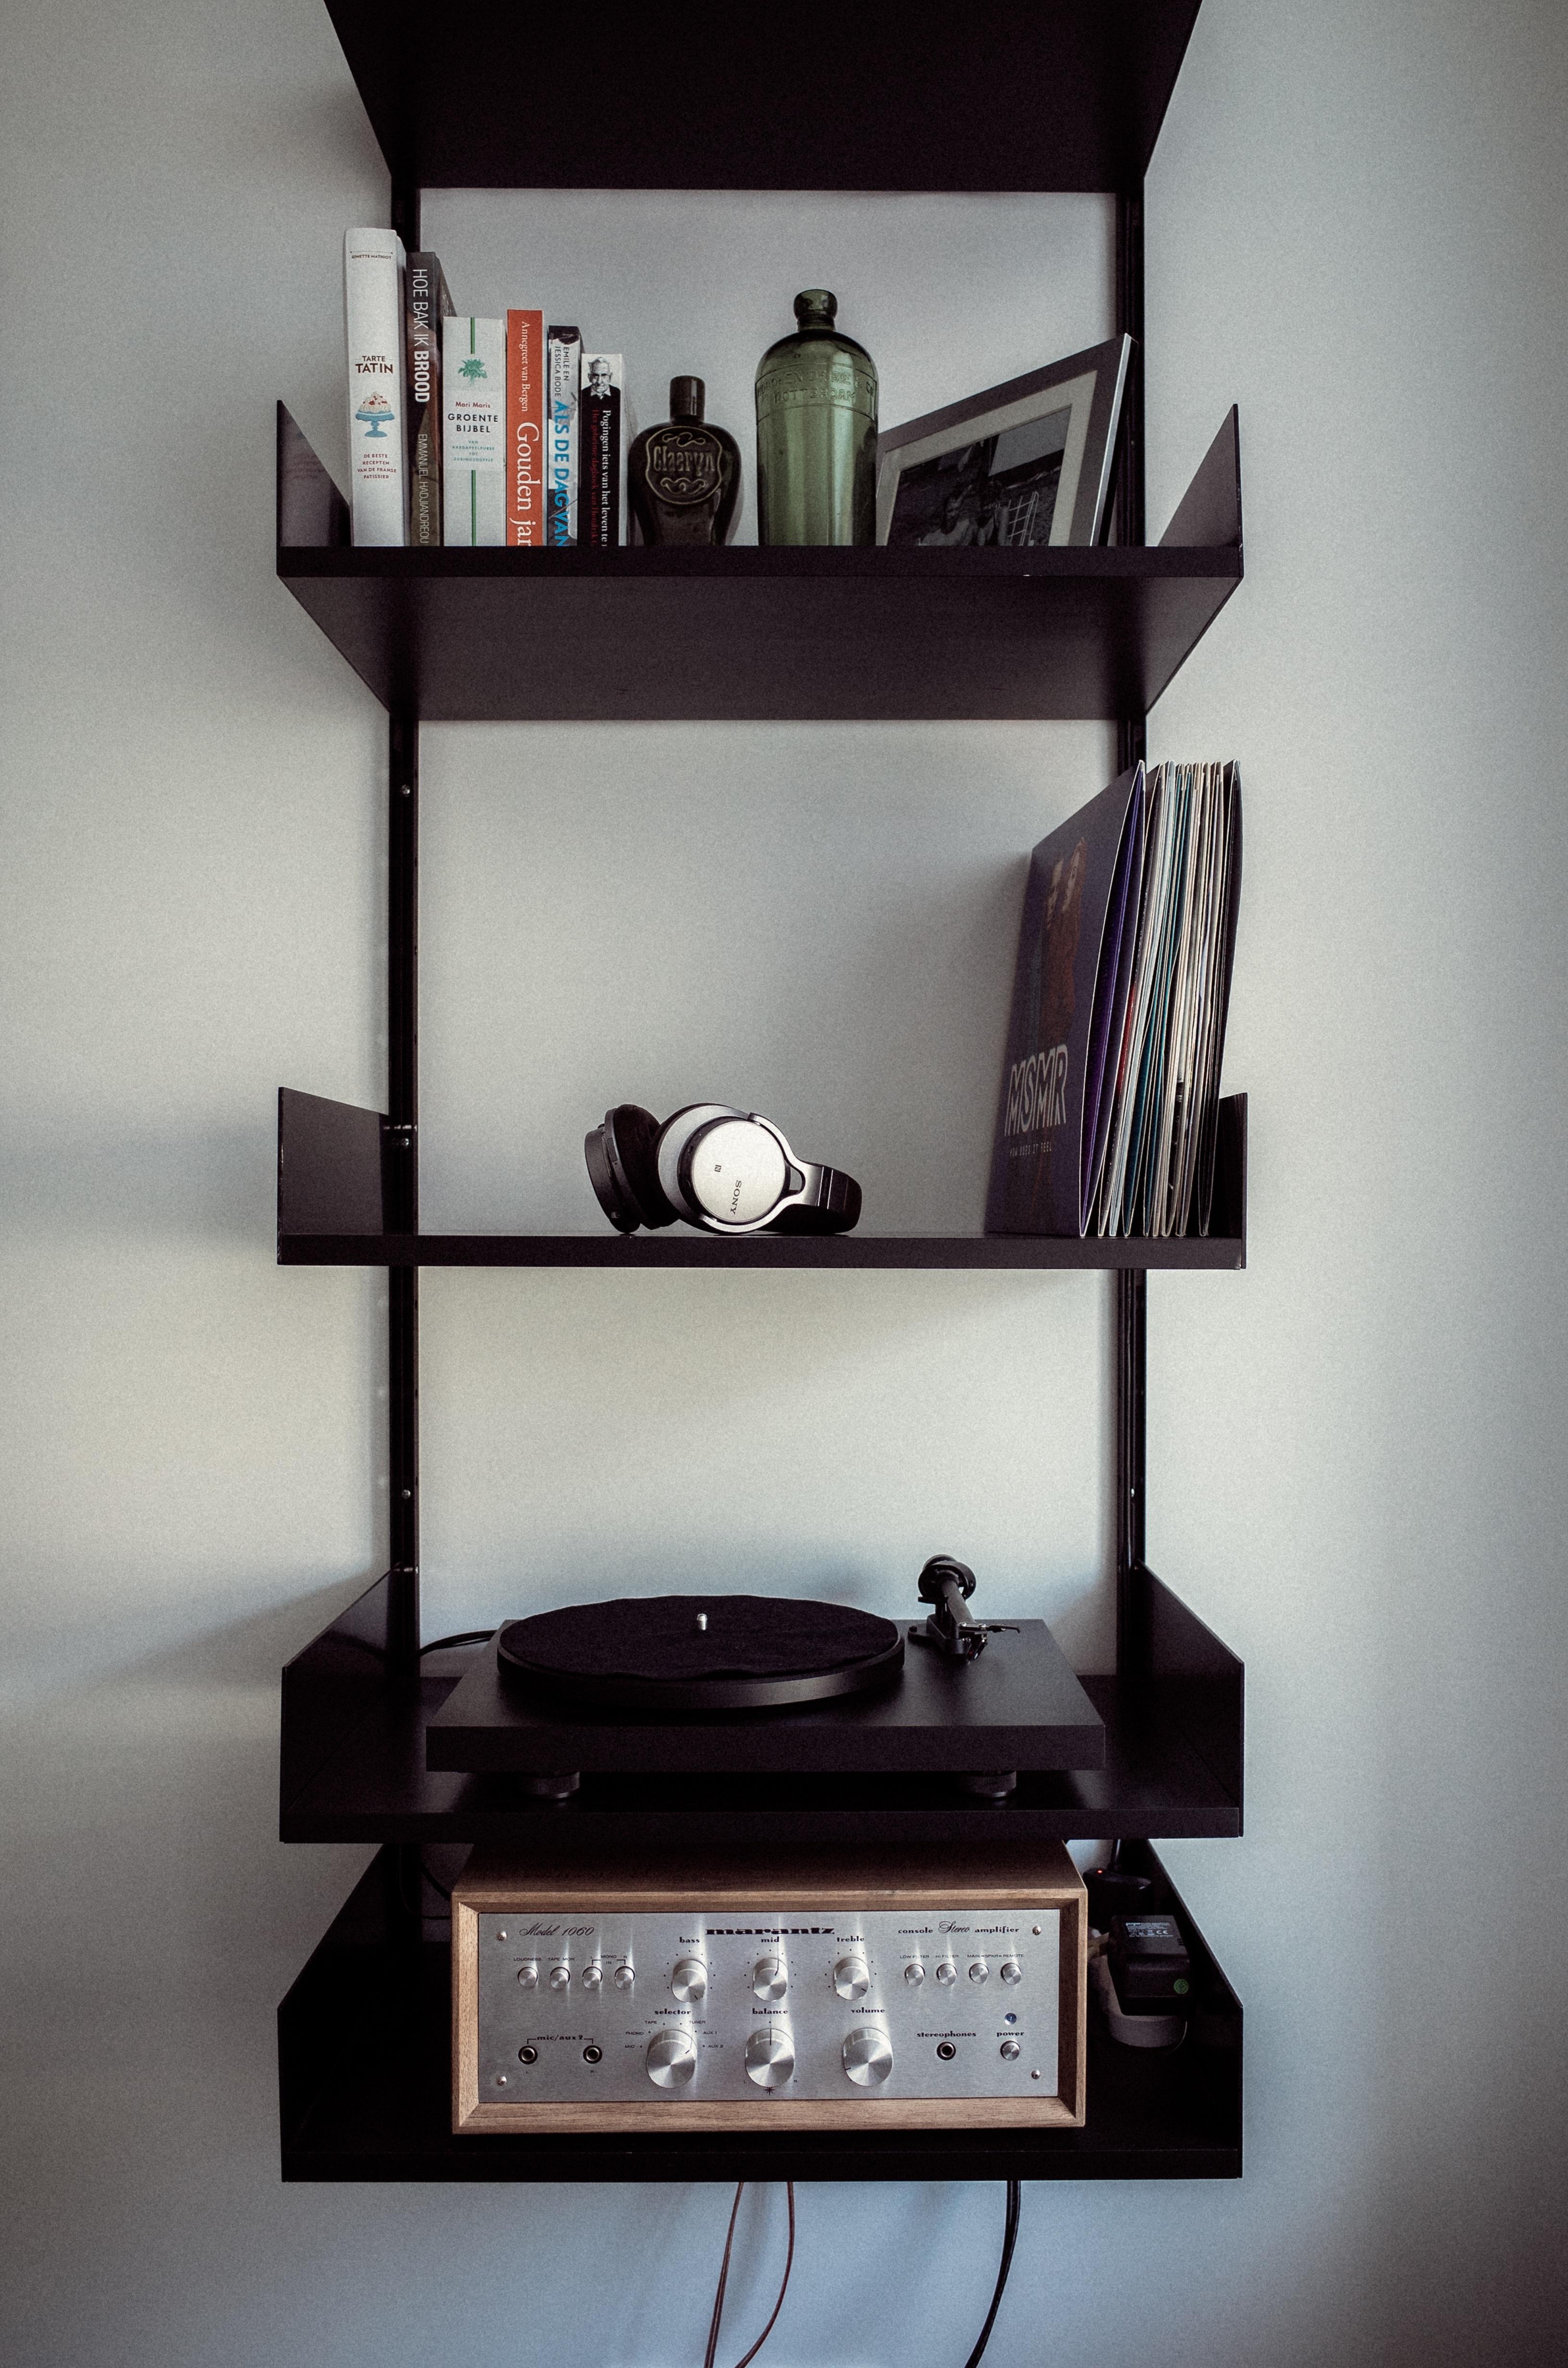 Table Record Music Interior Equipment Shelf Rack Furniture Room Lighting Modern Living Design Audio Books Style